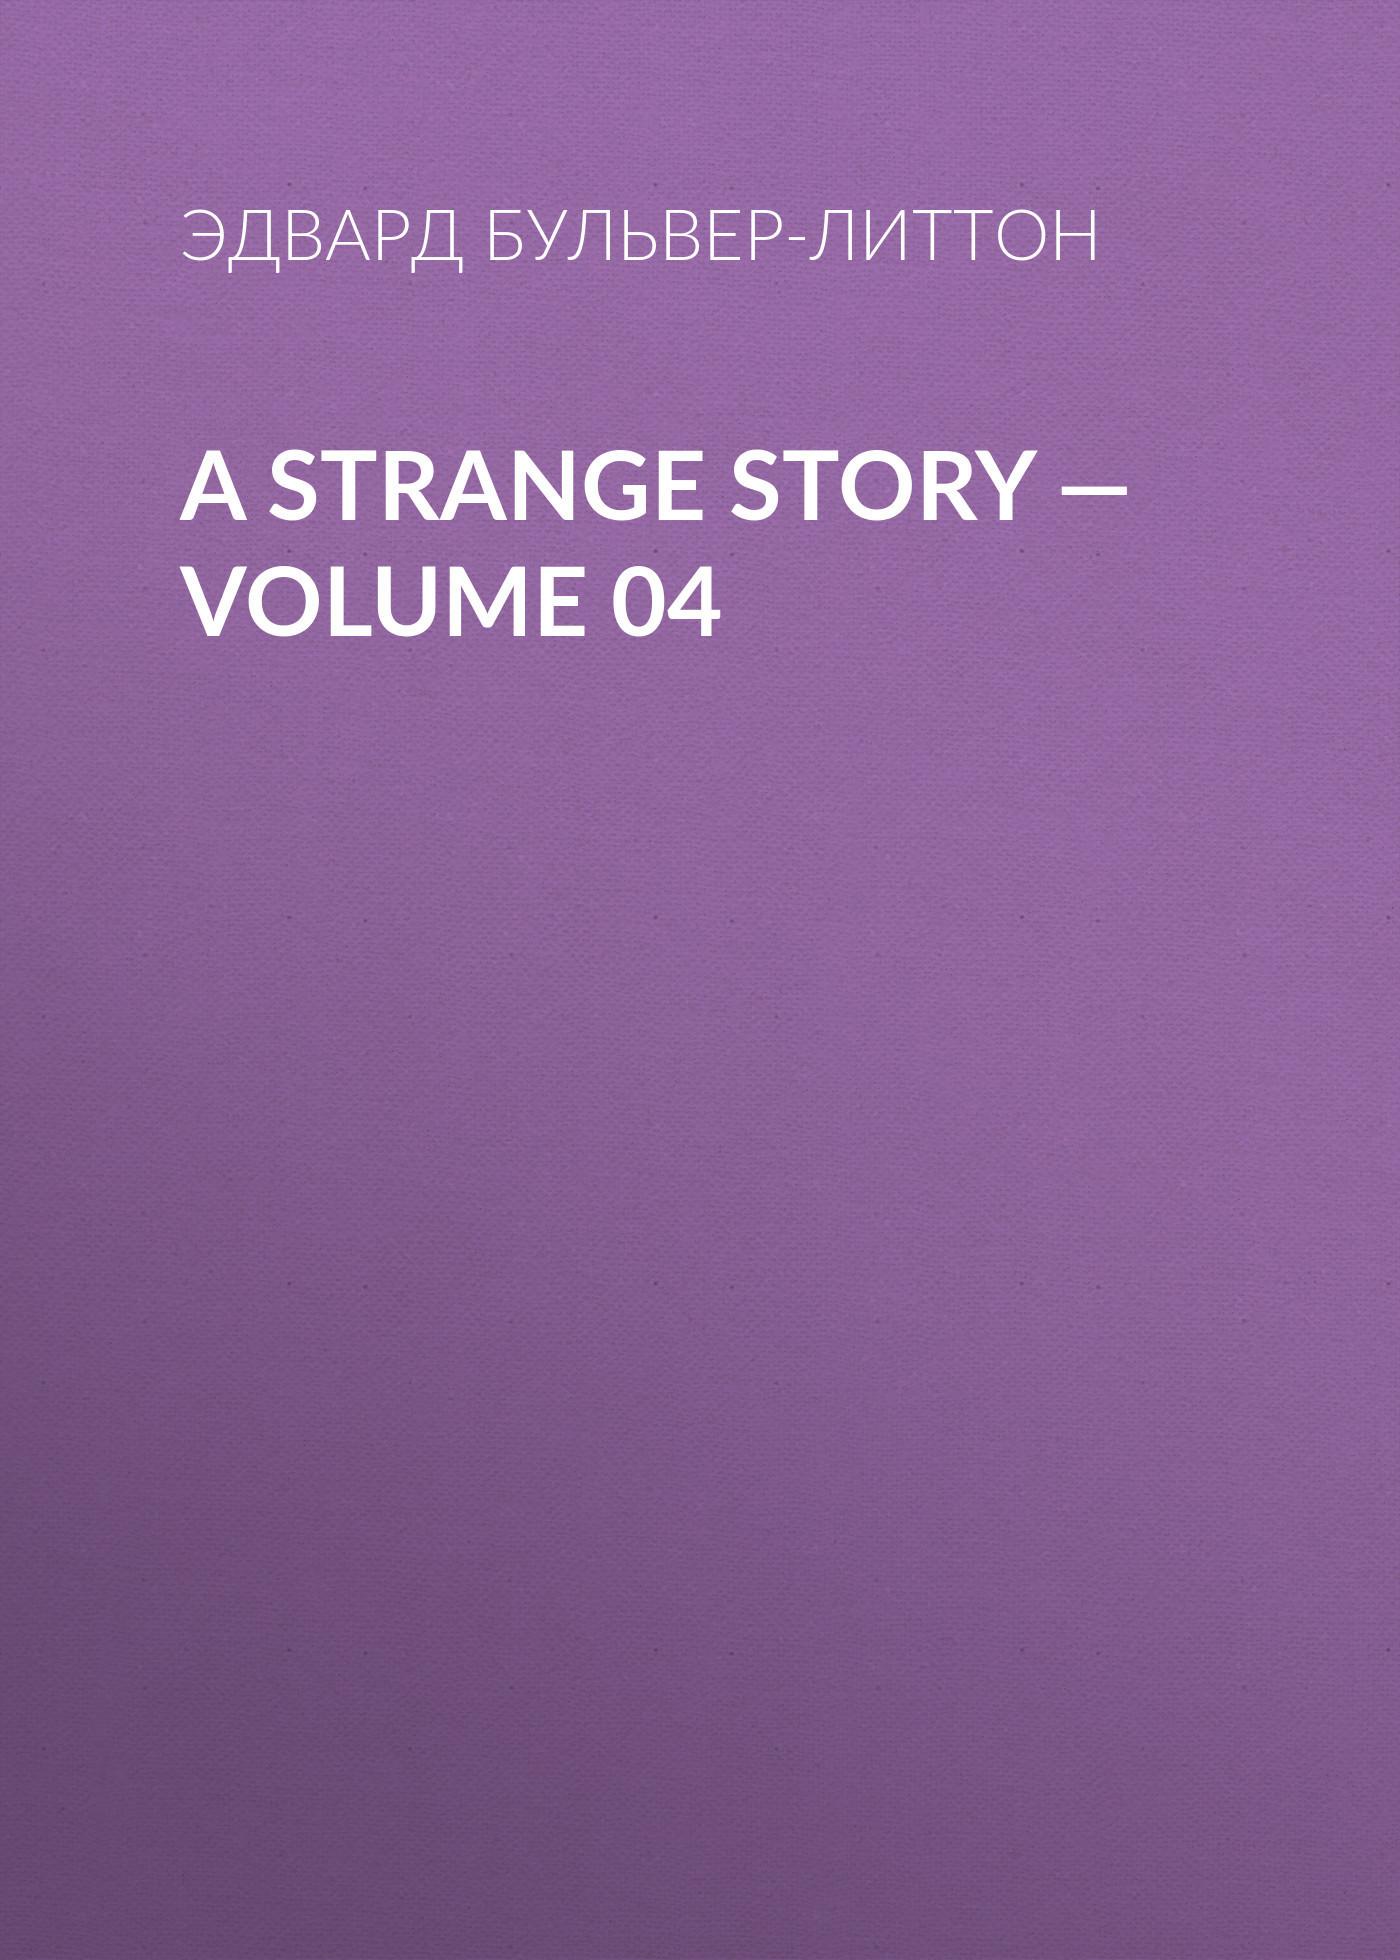 A Strange Story — Volume 04